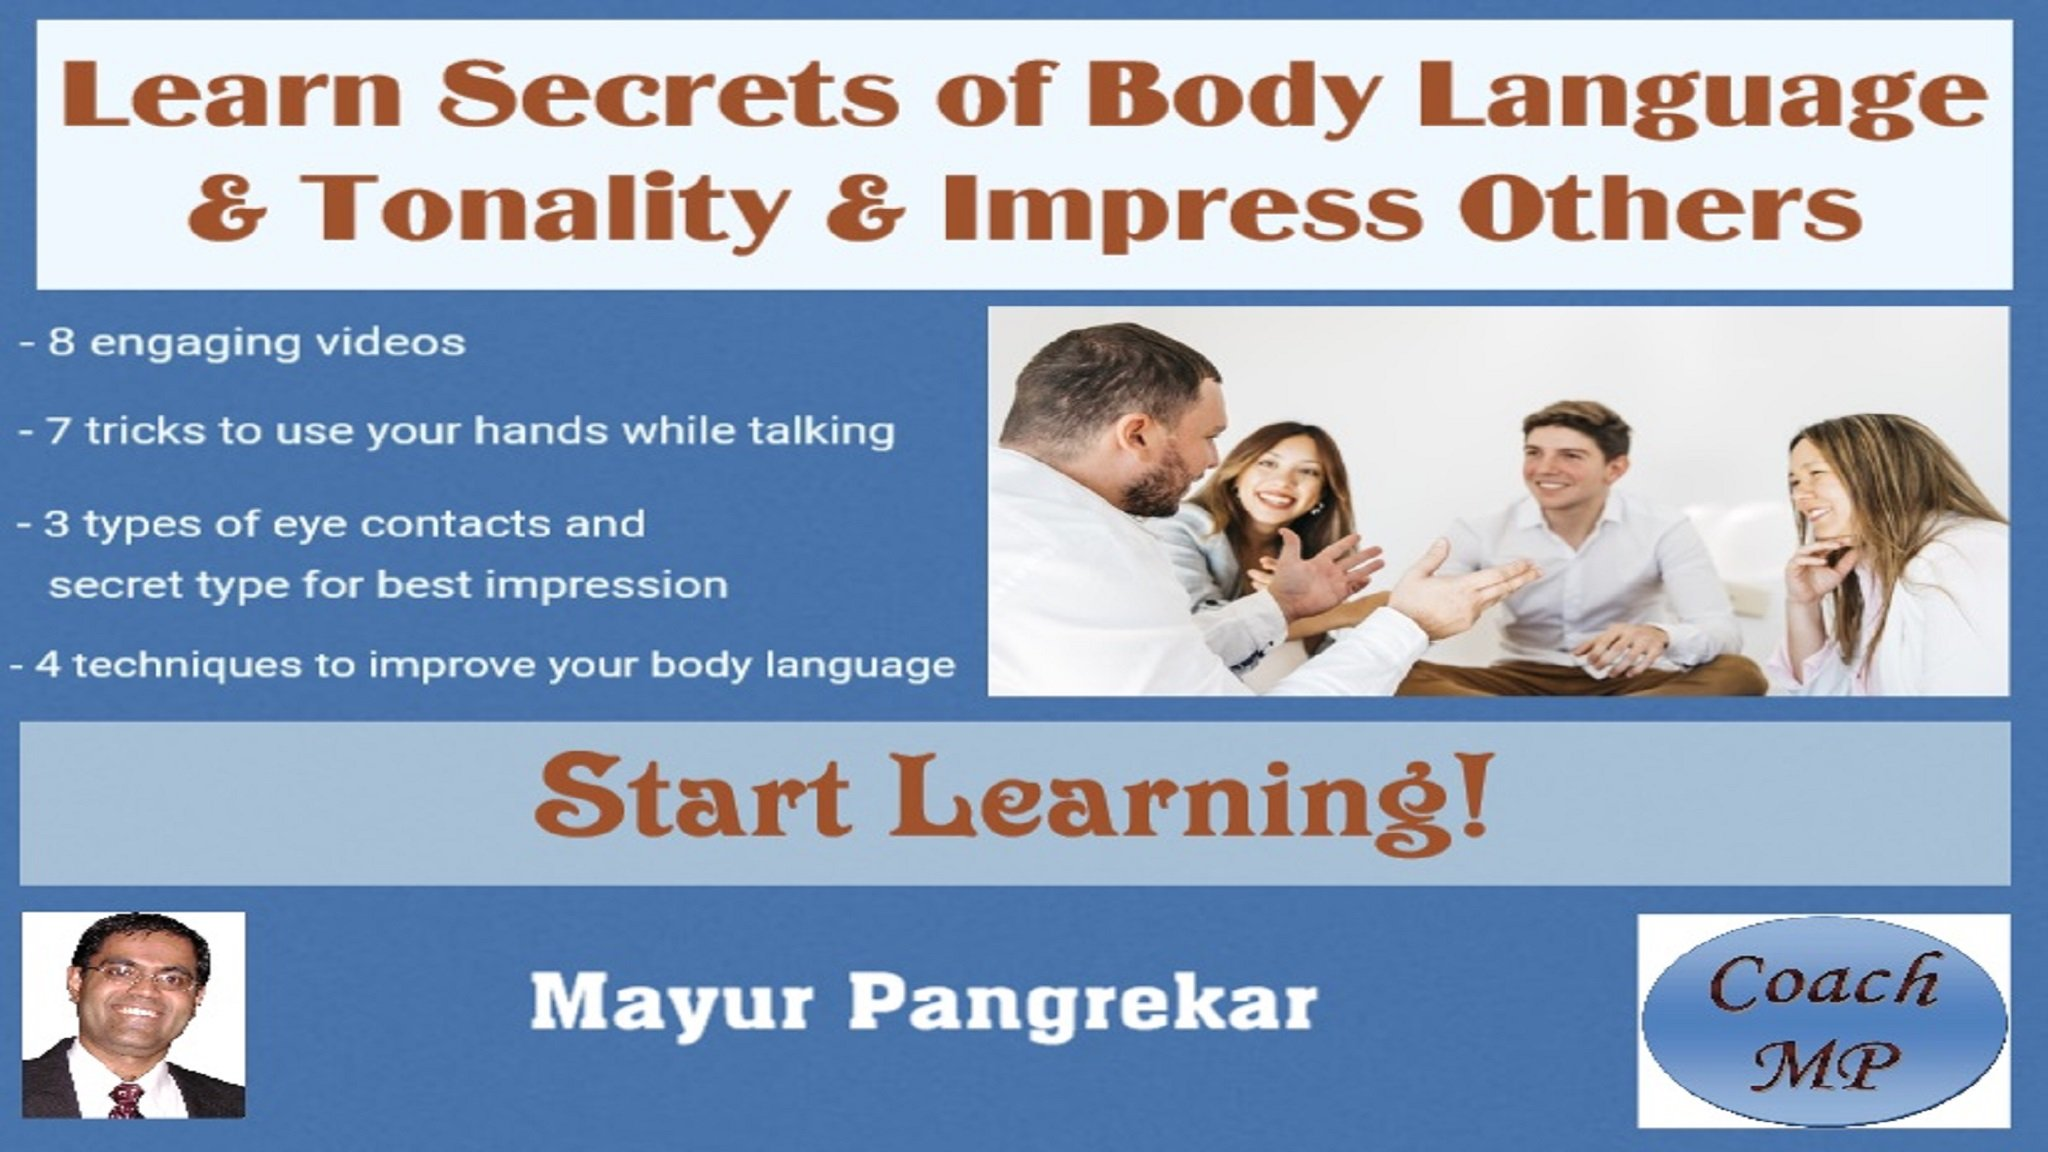 Learn Secrets of Body Language & Tonality & Impress Others